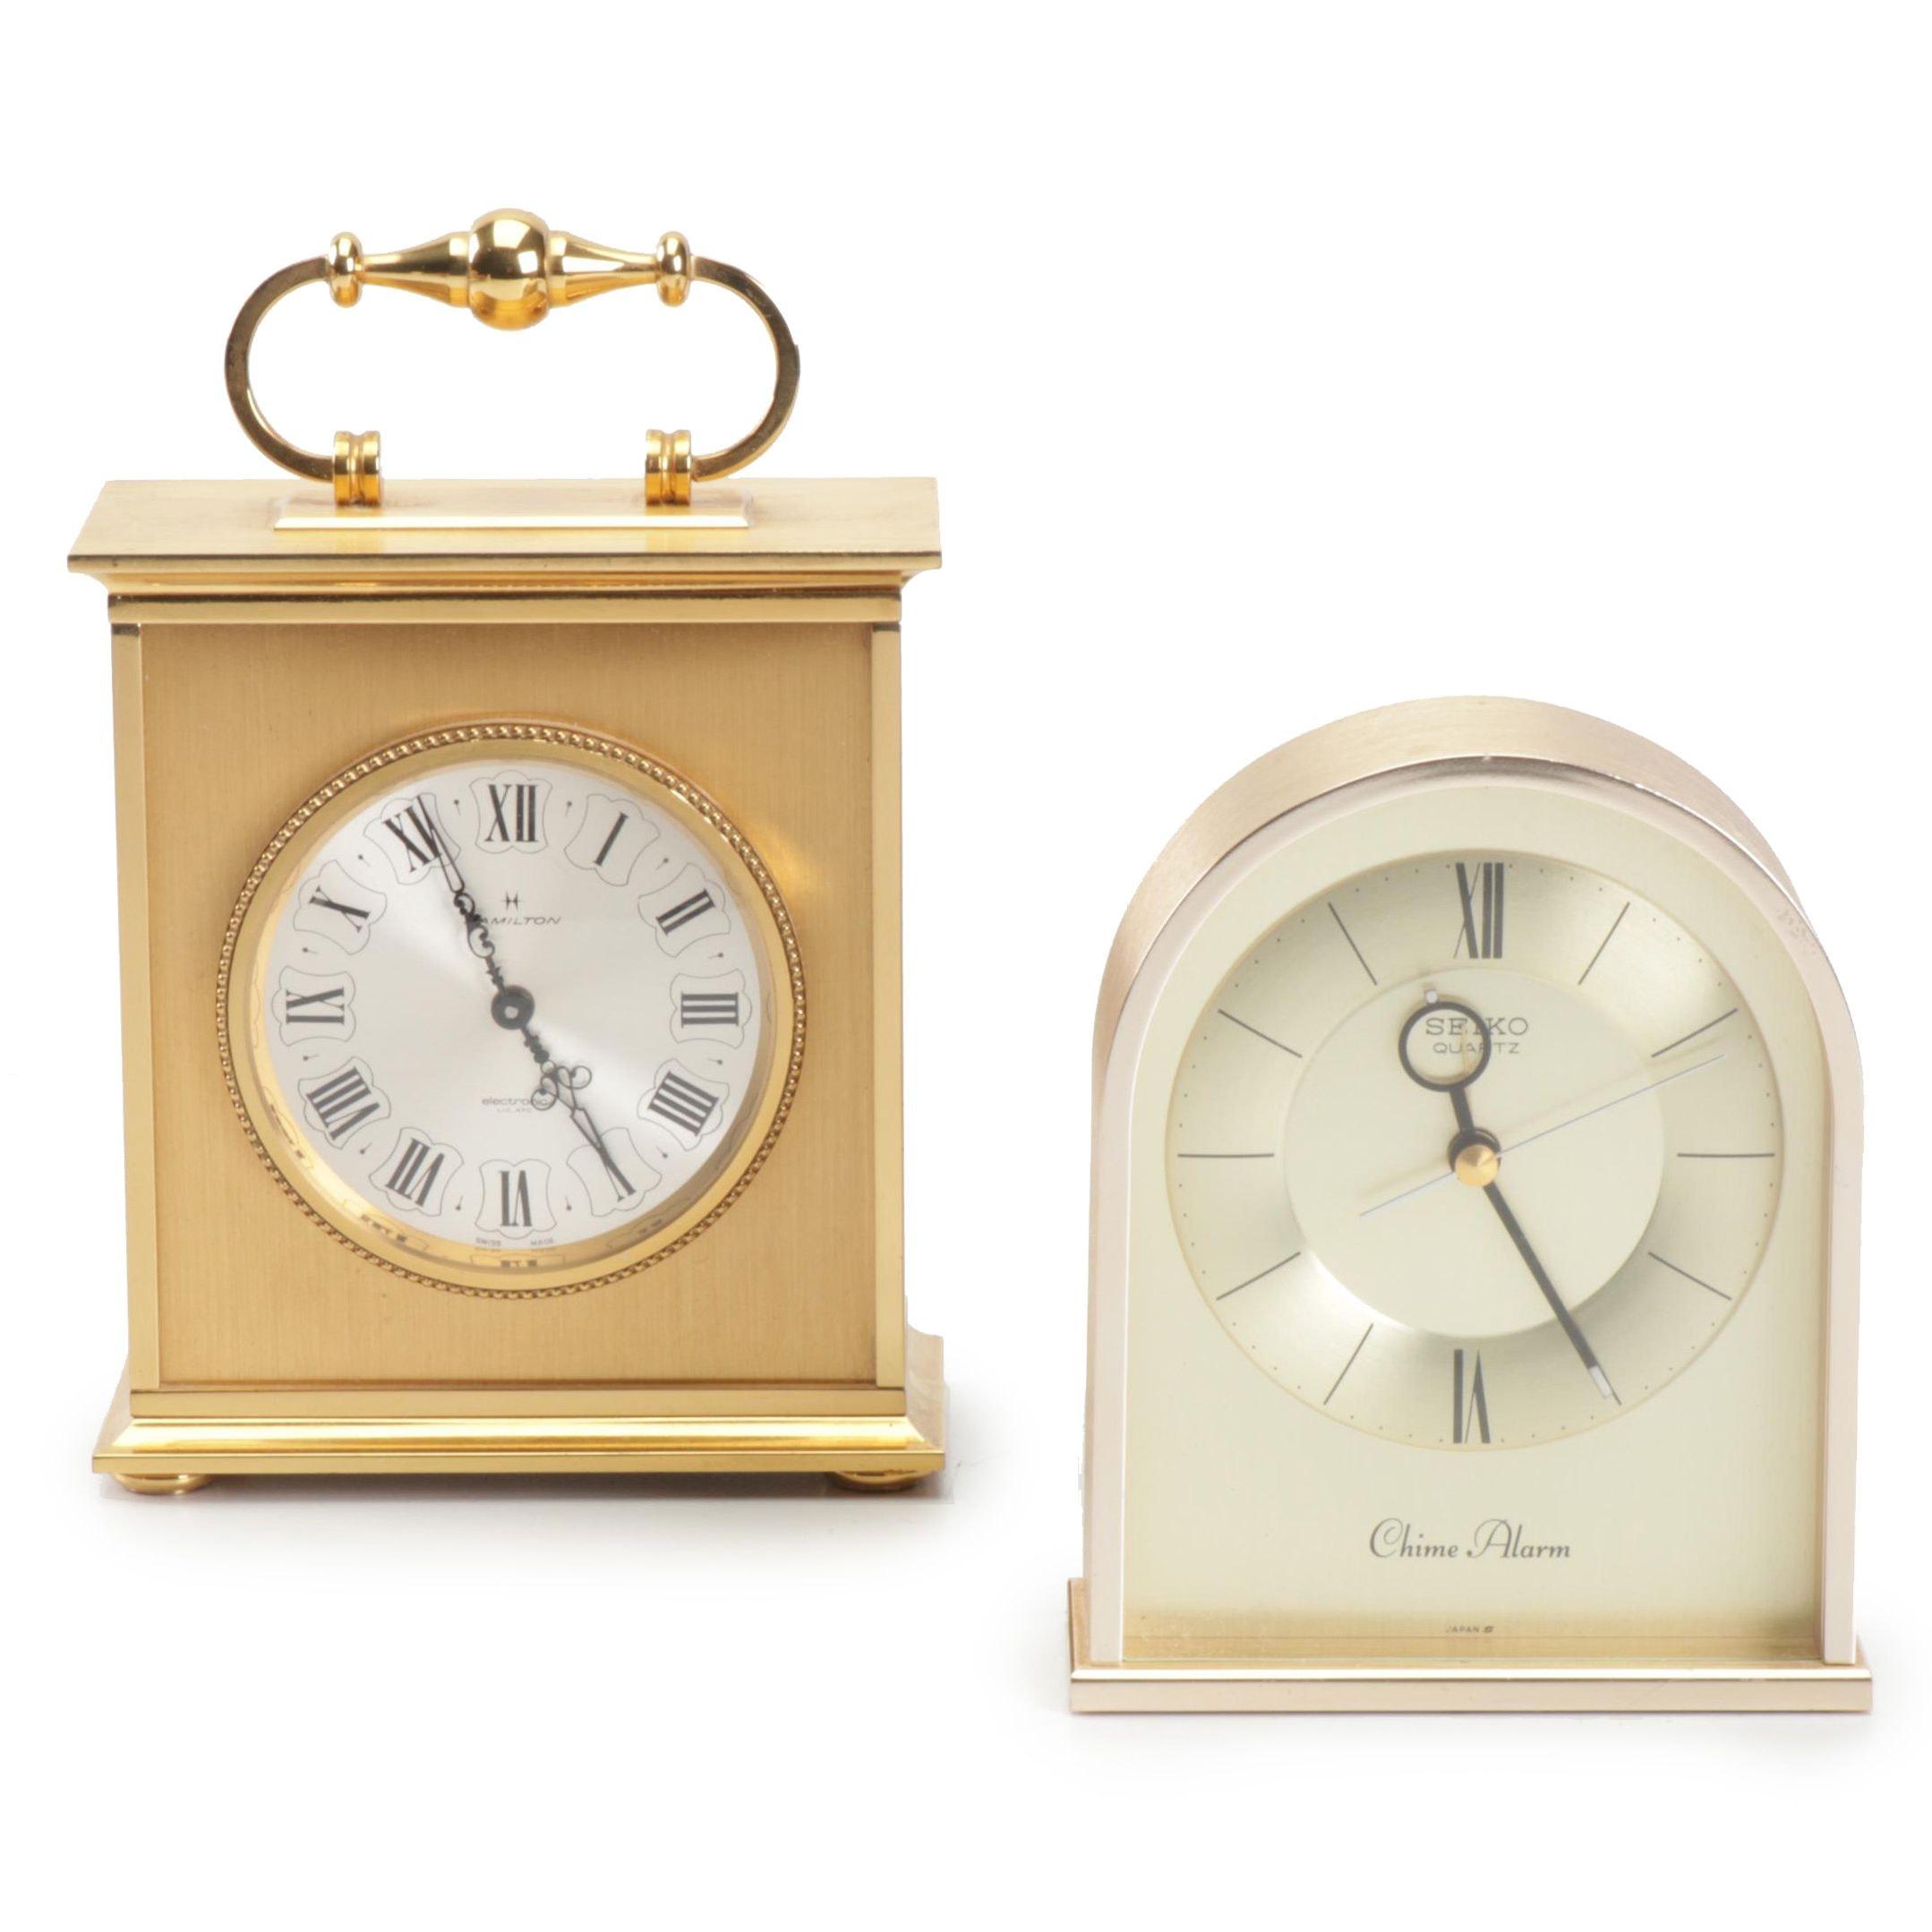 Contemporary Hamilton Swiss Made Carriage Clock and Seiko Chime Alarm Clock